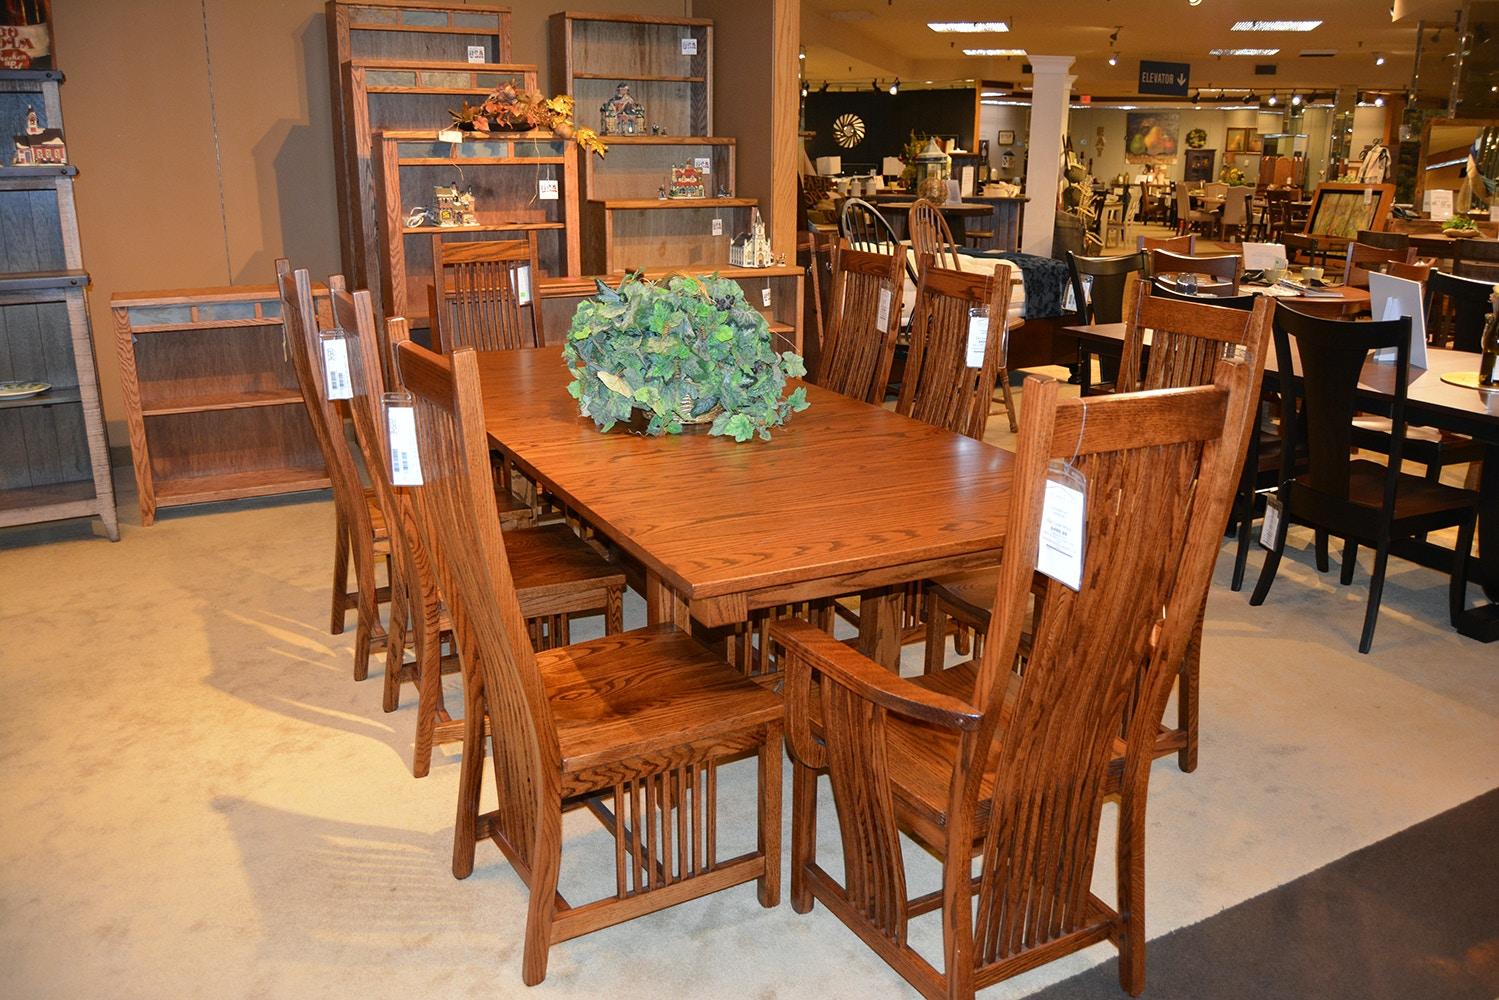 Beautiful Danielu0027s Amish Table And 4 Chairs 42722 LEGEN5PC At Gustafsonu0027s Furniture  And Mattress